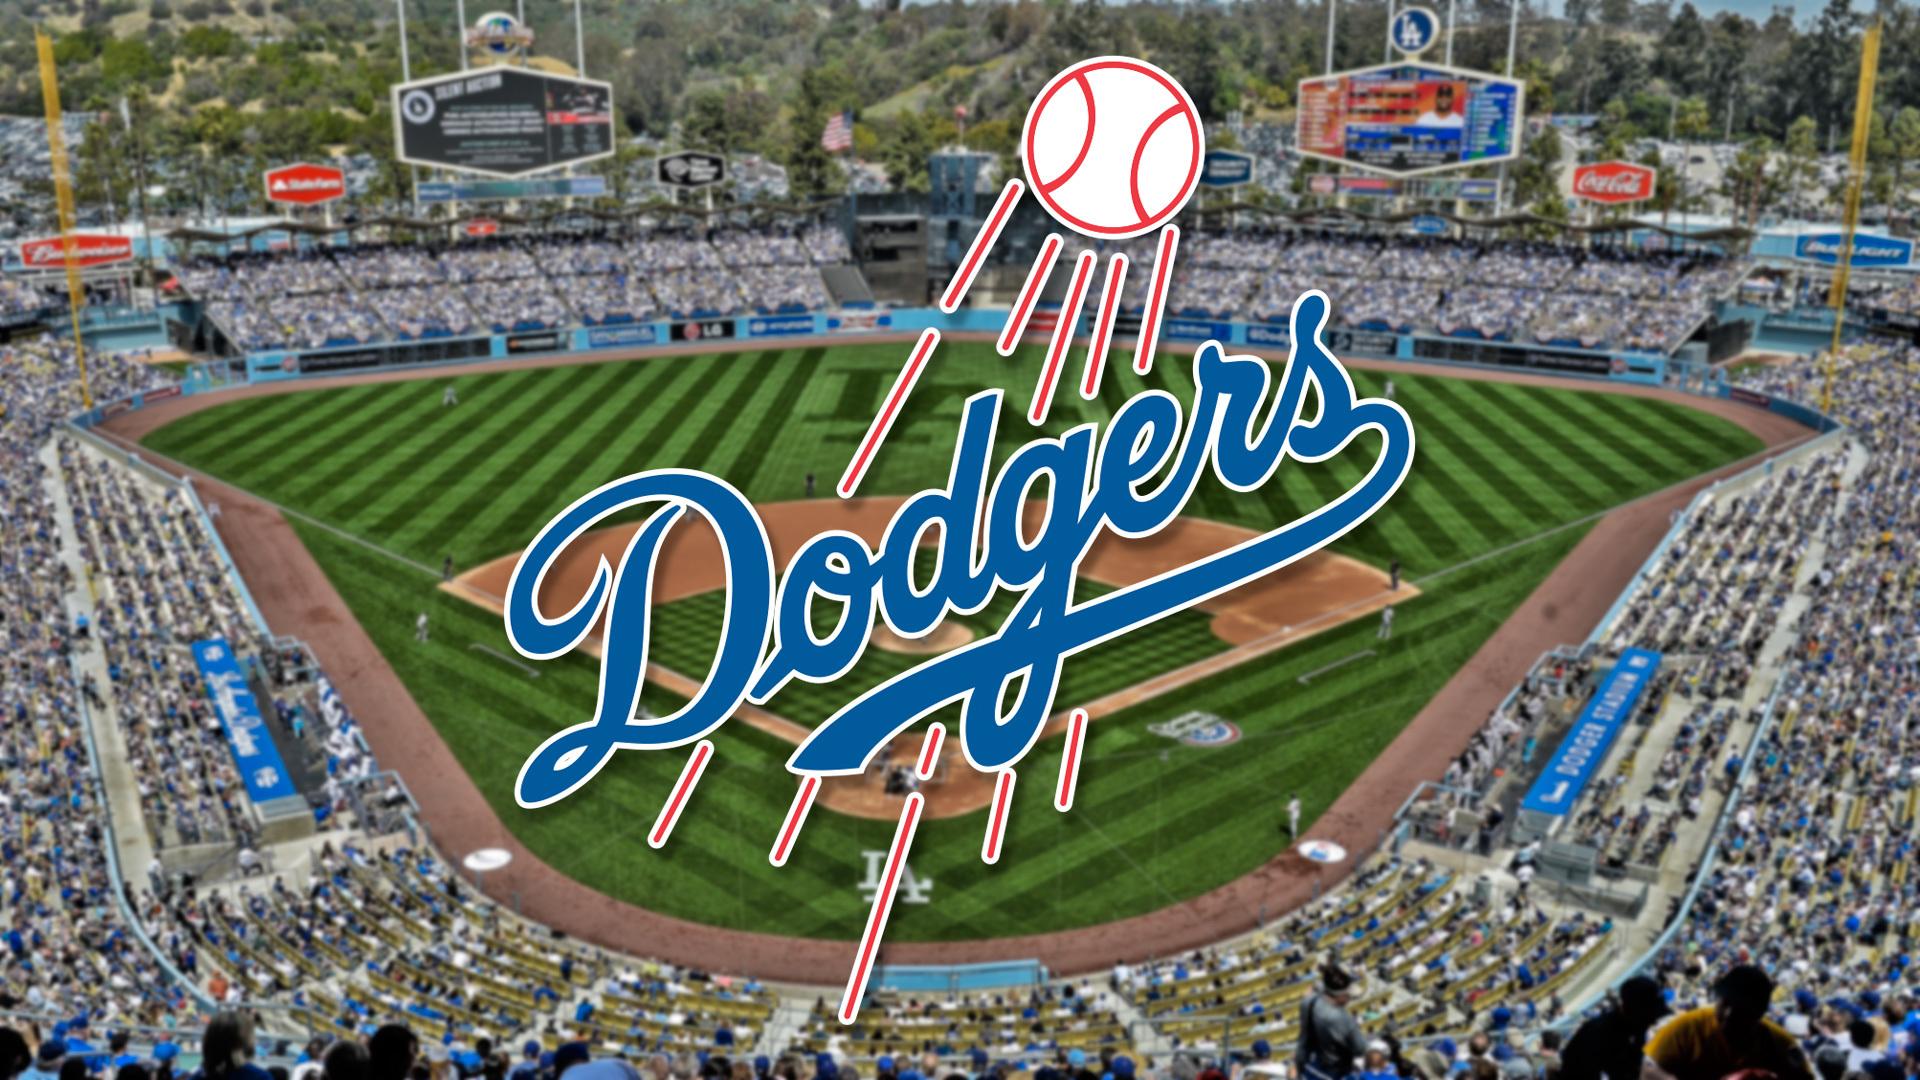 Dodgers Images